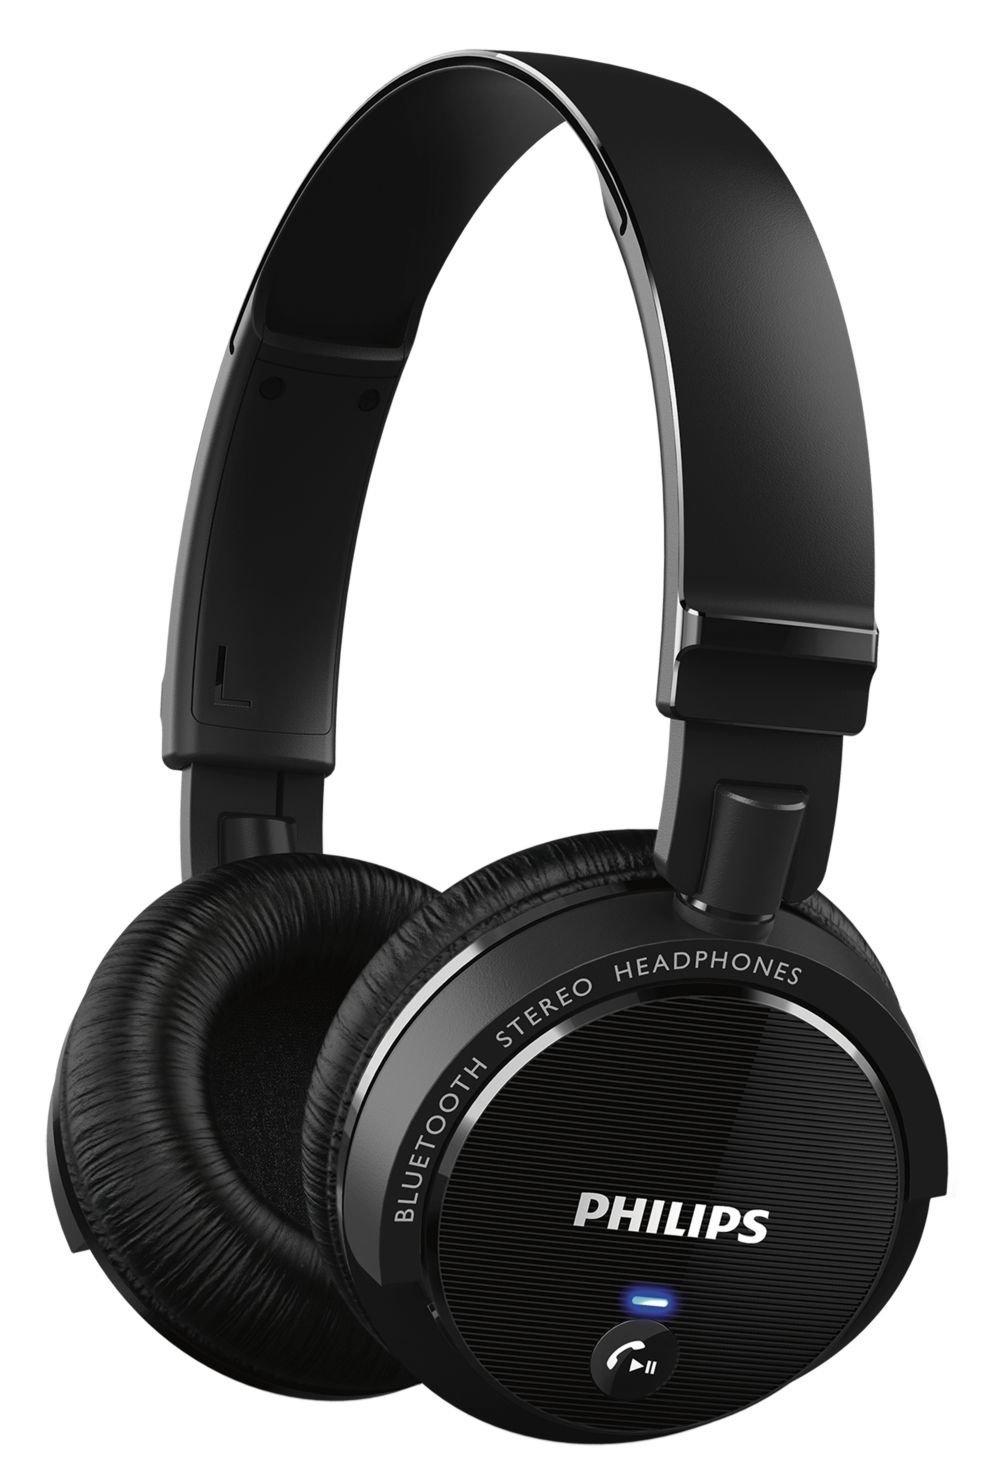 Philips SHB5500 Bluetooth Headphones